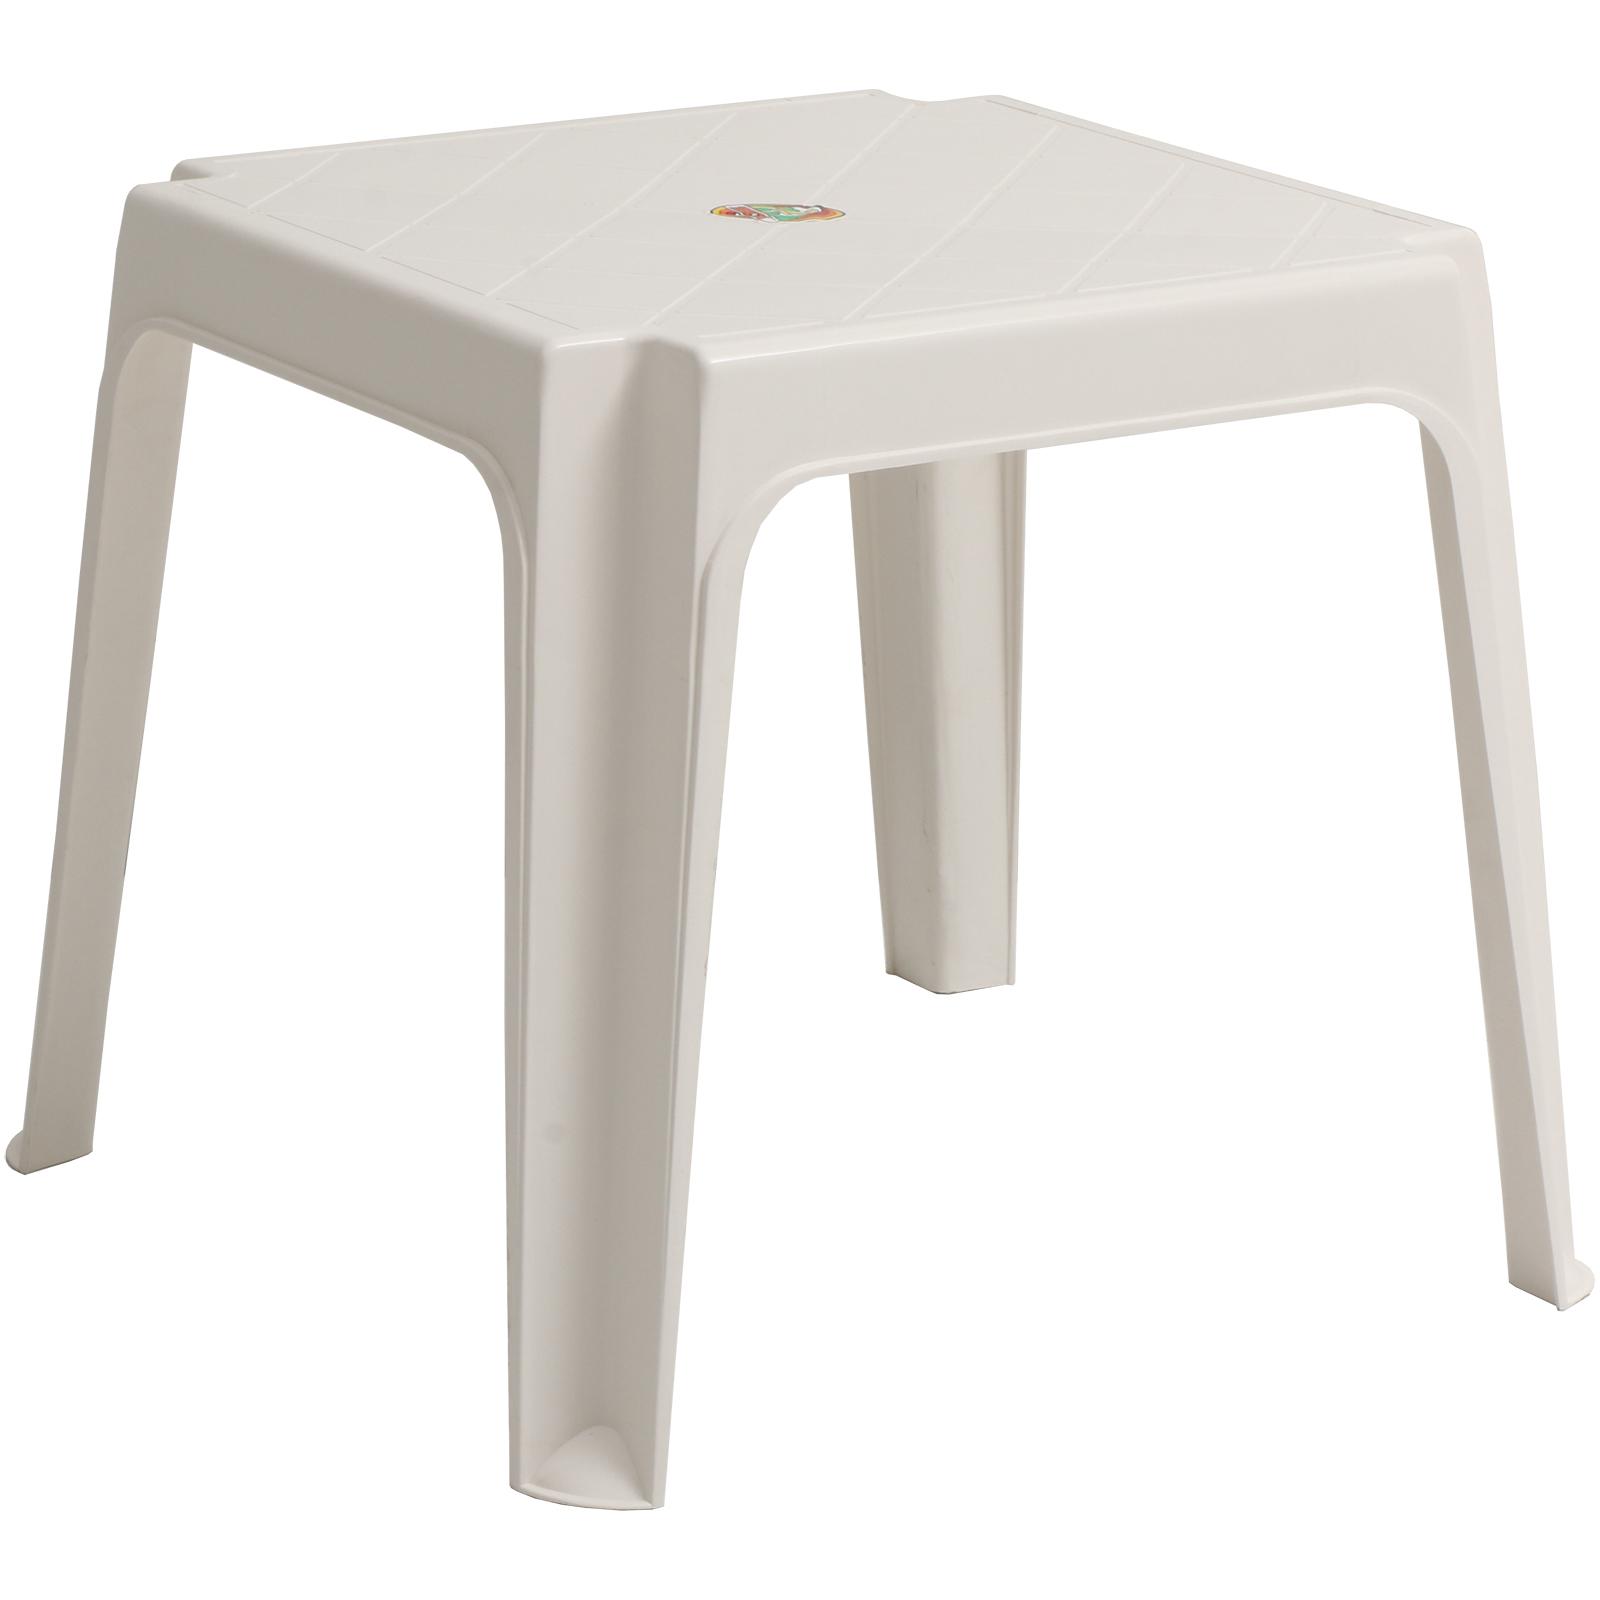 sun lounger side coffee table white plastic outdoor garden patio furniture stool 5055493880801 ebay